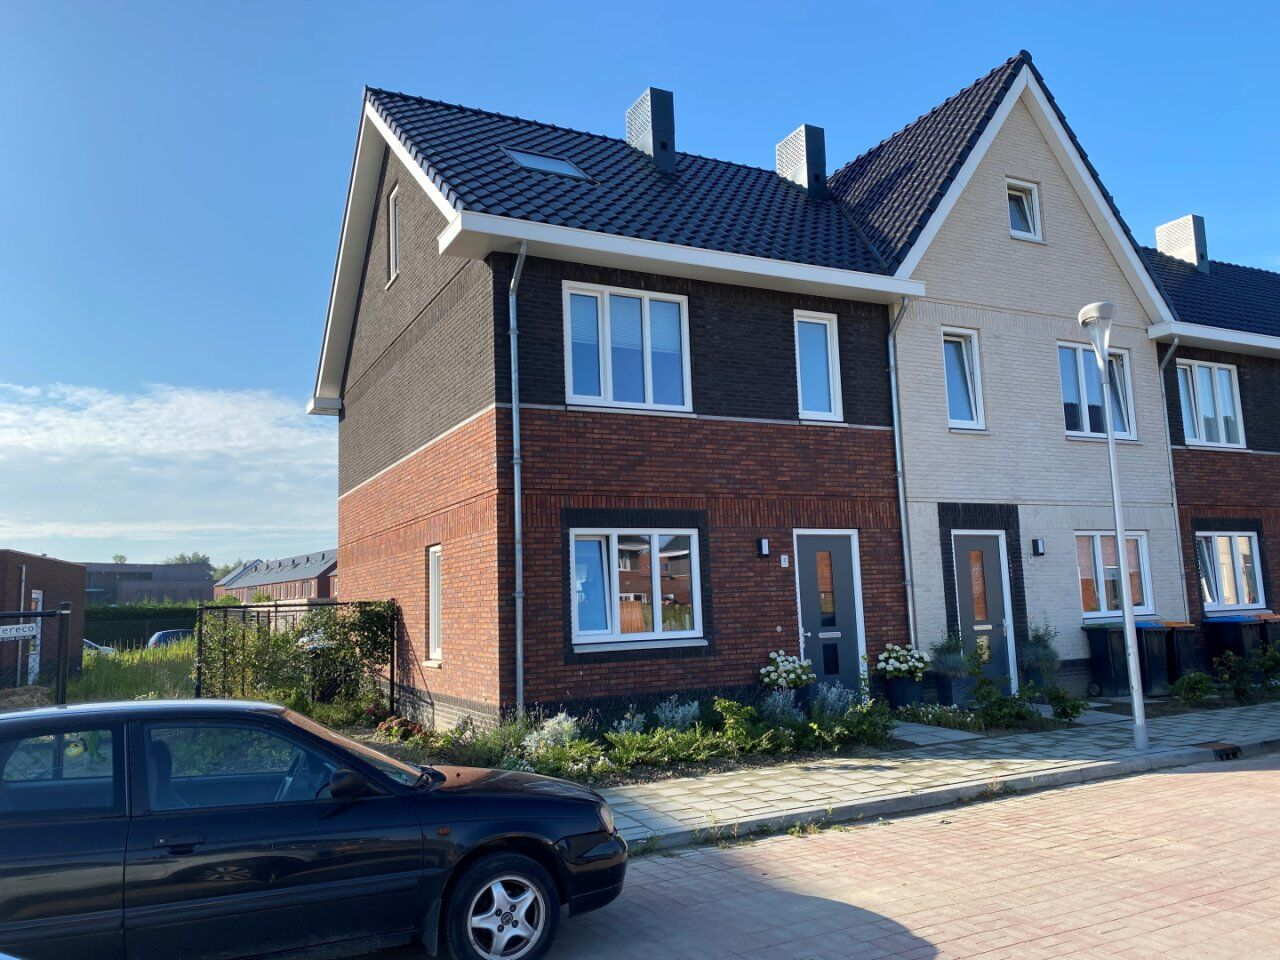 7189-lunet_2-steenbergen-524930729